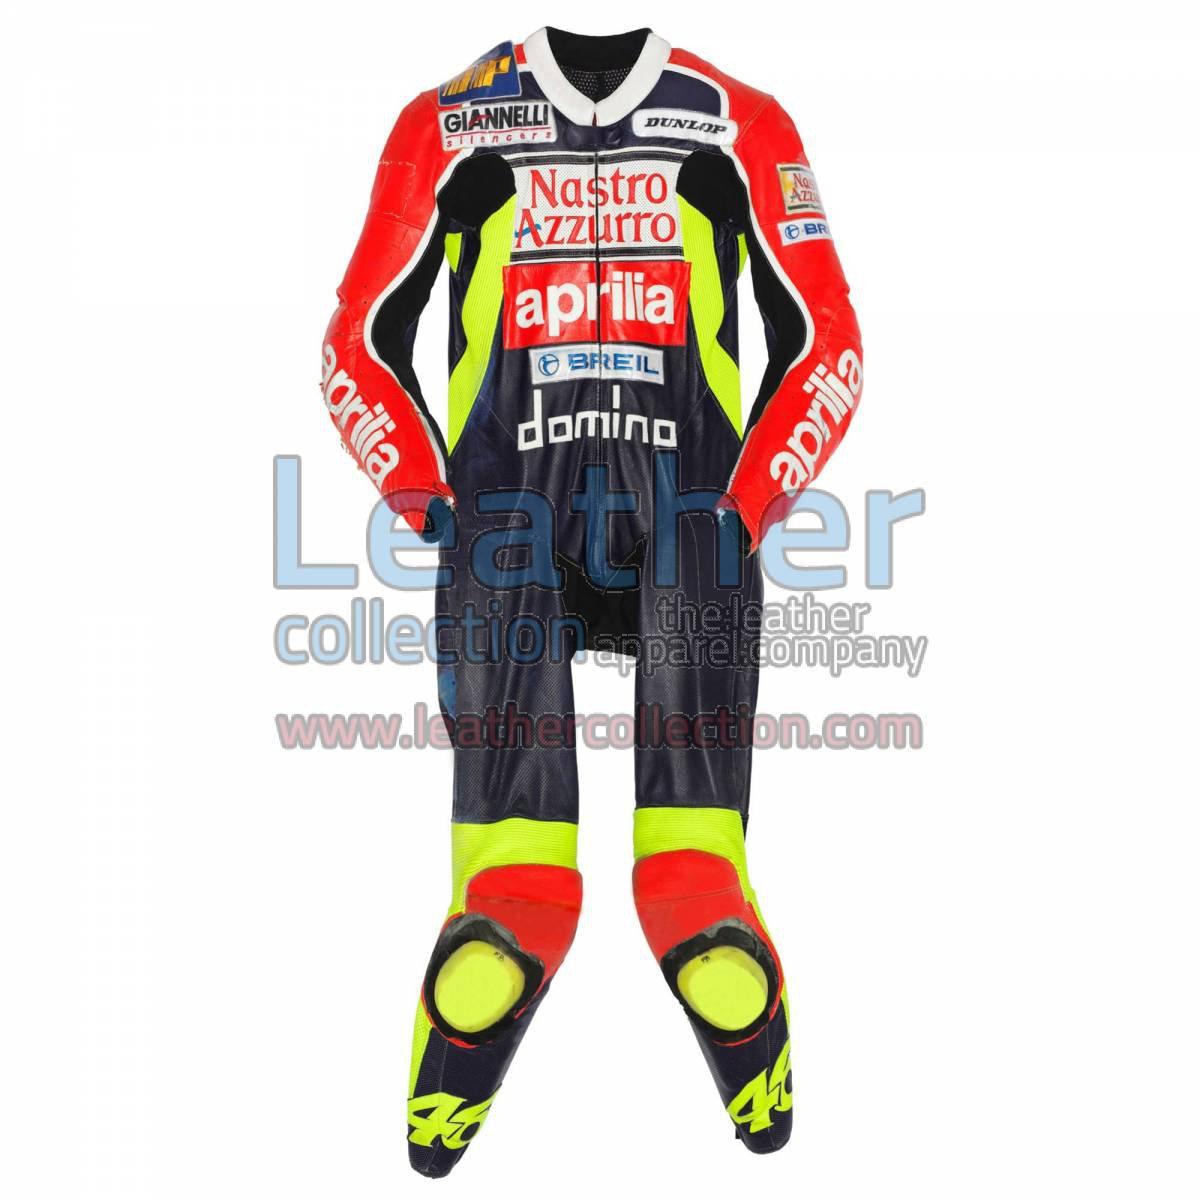 Valentino Rossi Aprilia GP 1998 Leather Suit